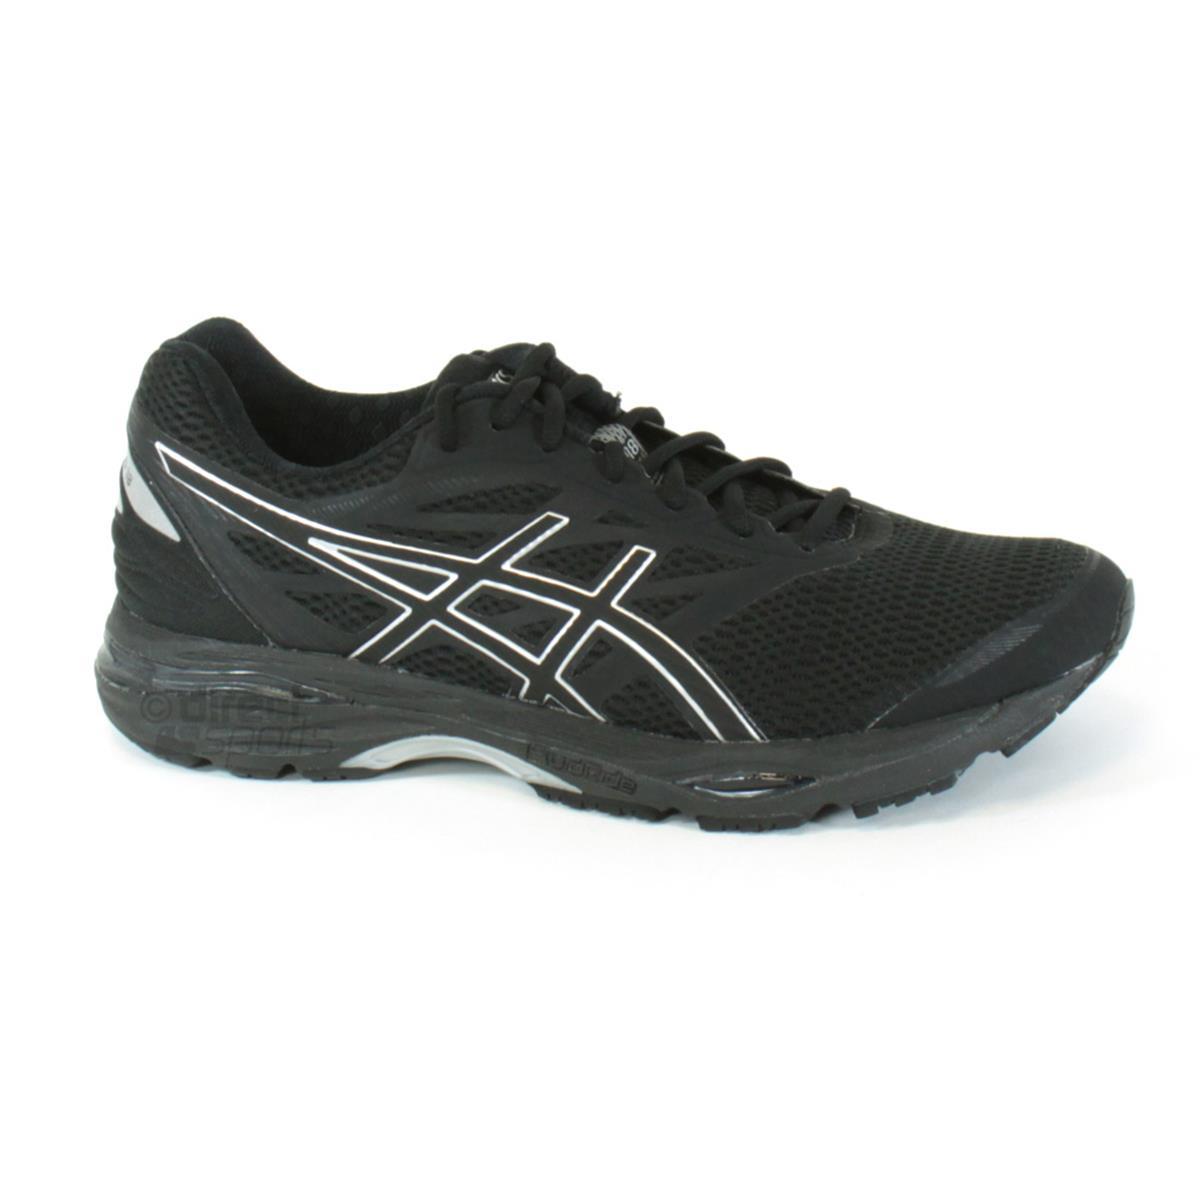 Asics Gel Cumulus 18 Mens Running Shoes (Black) | Direct